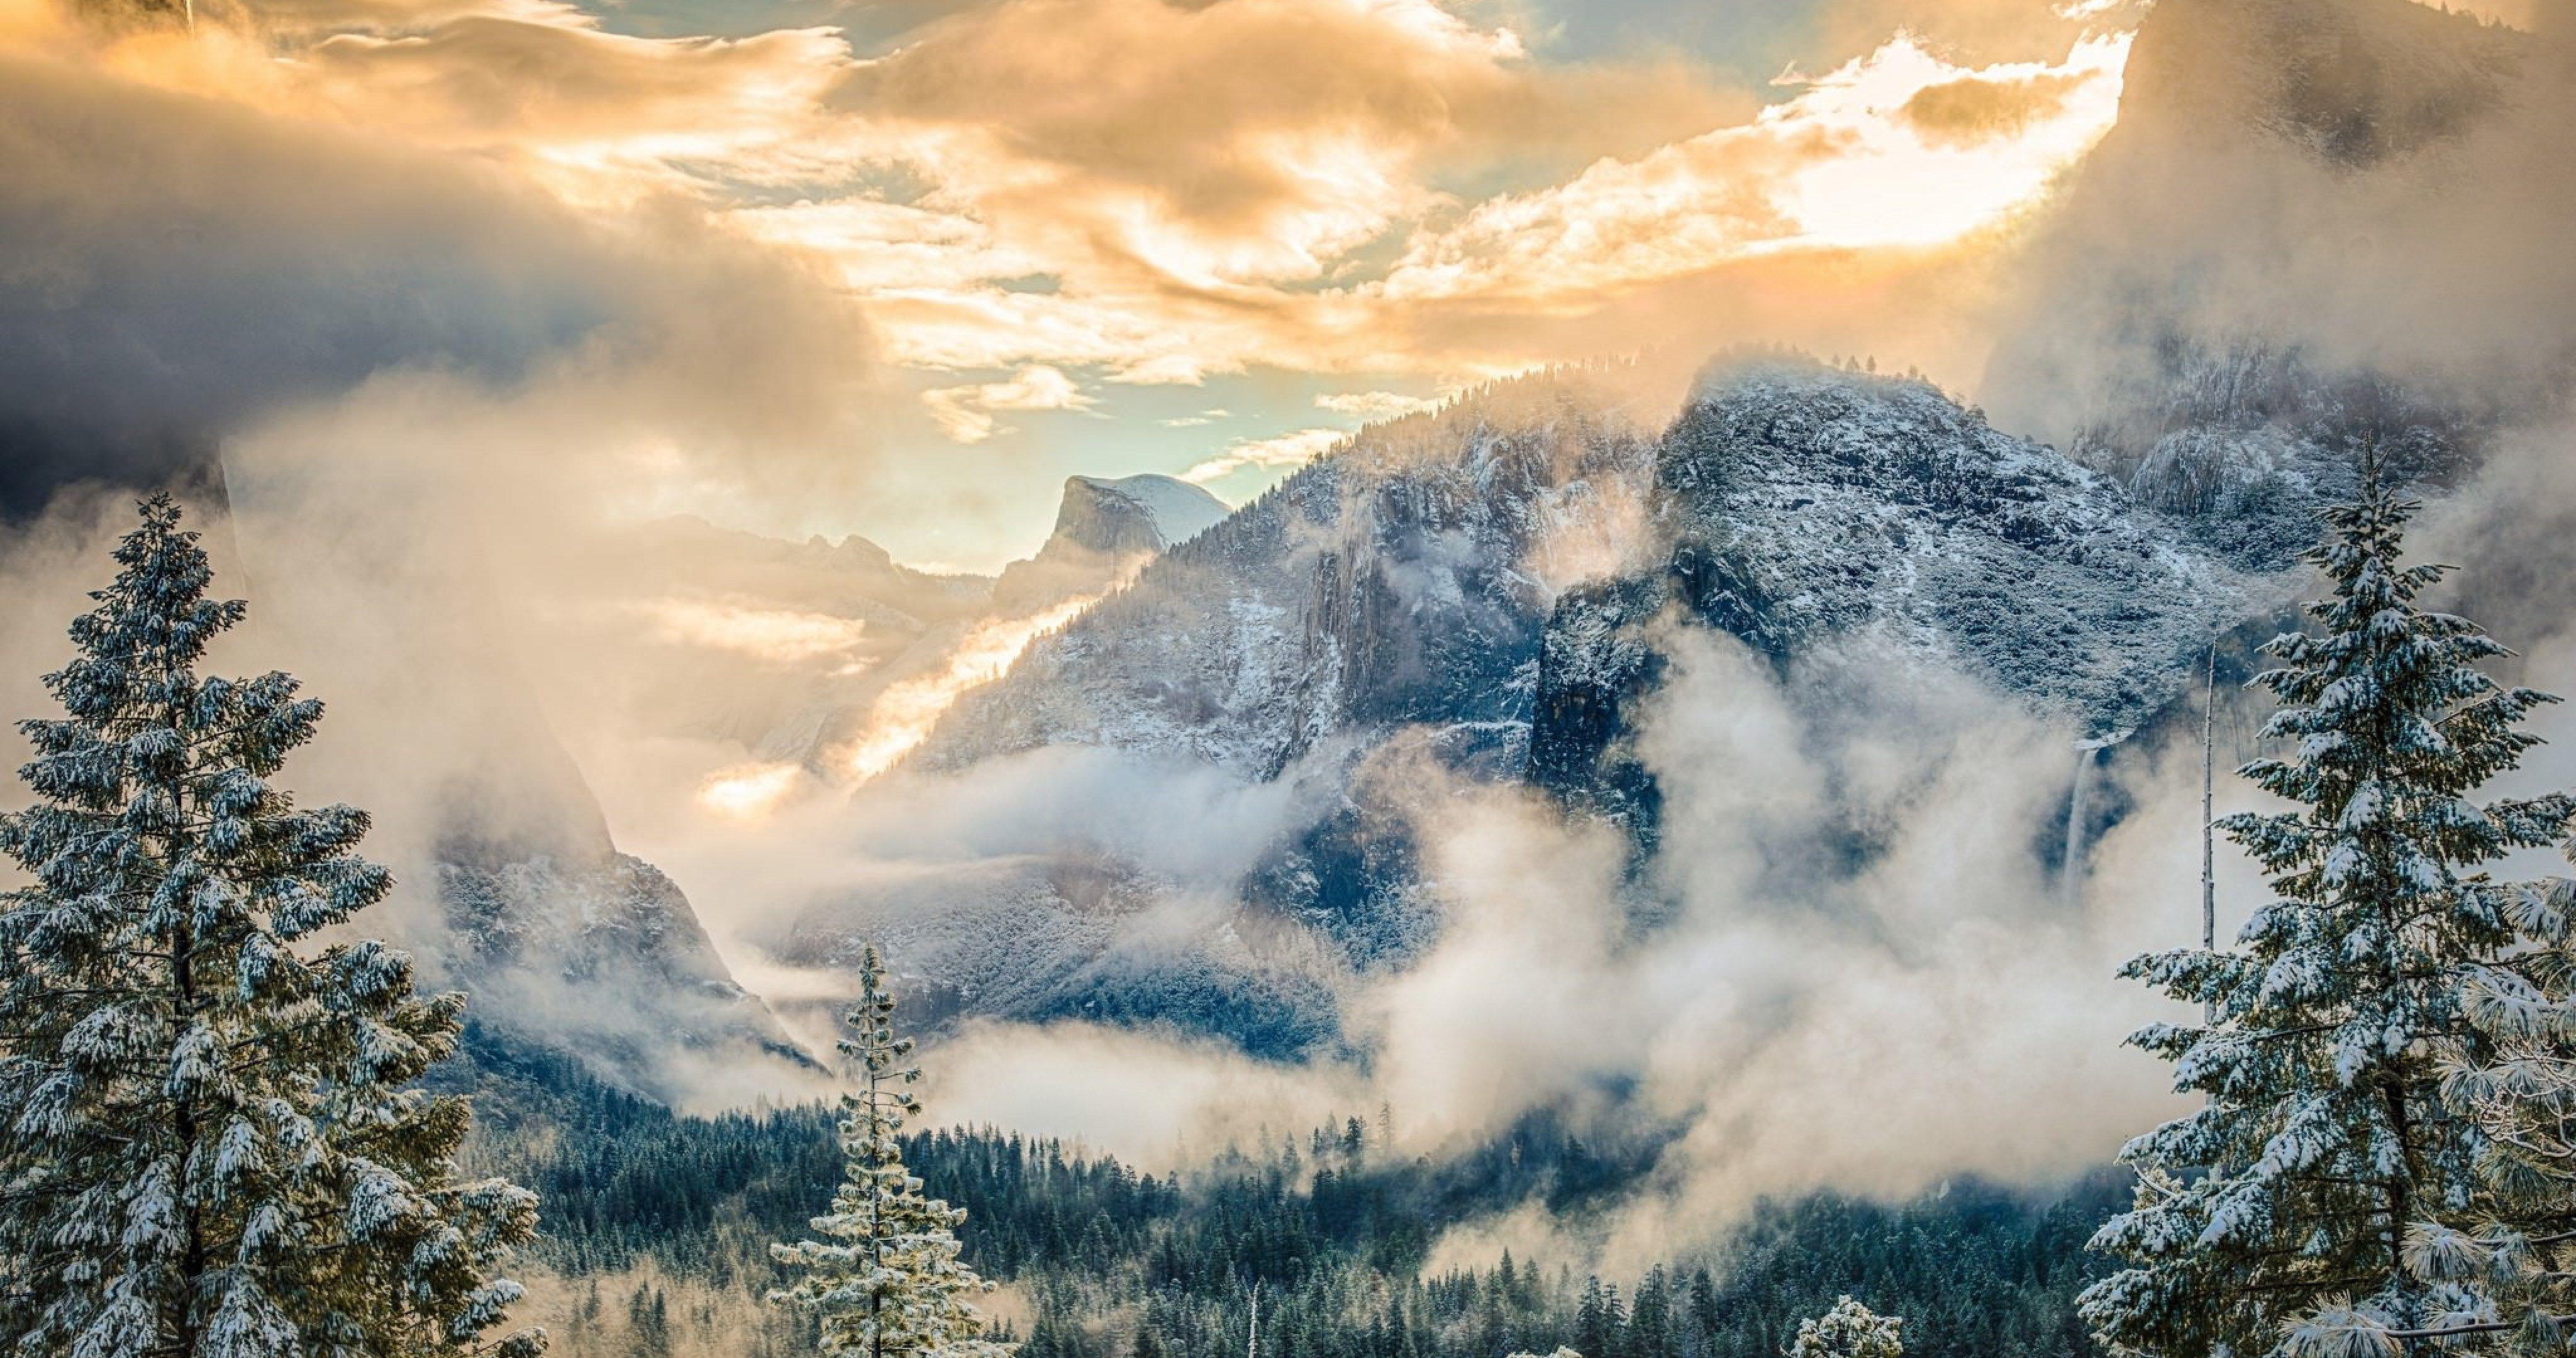 Yosemite National Park 4k Ultra Hd Wallpaper Nature Wallpaper National Parks Park Forest